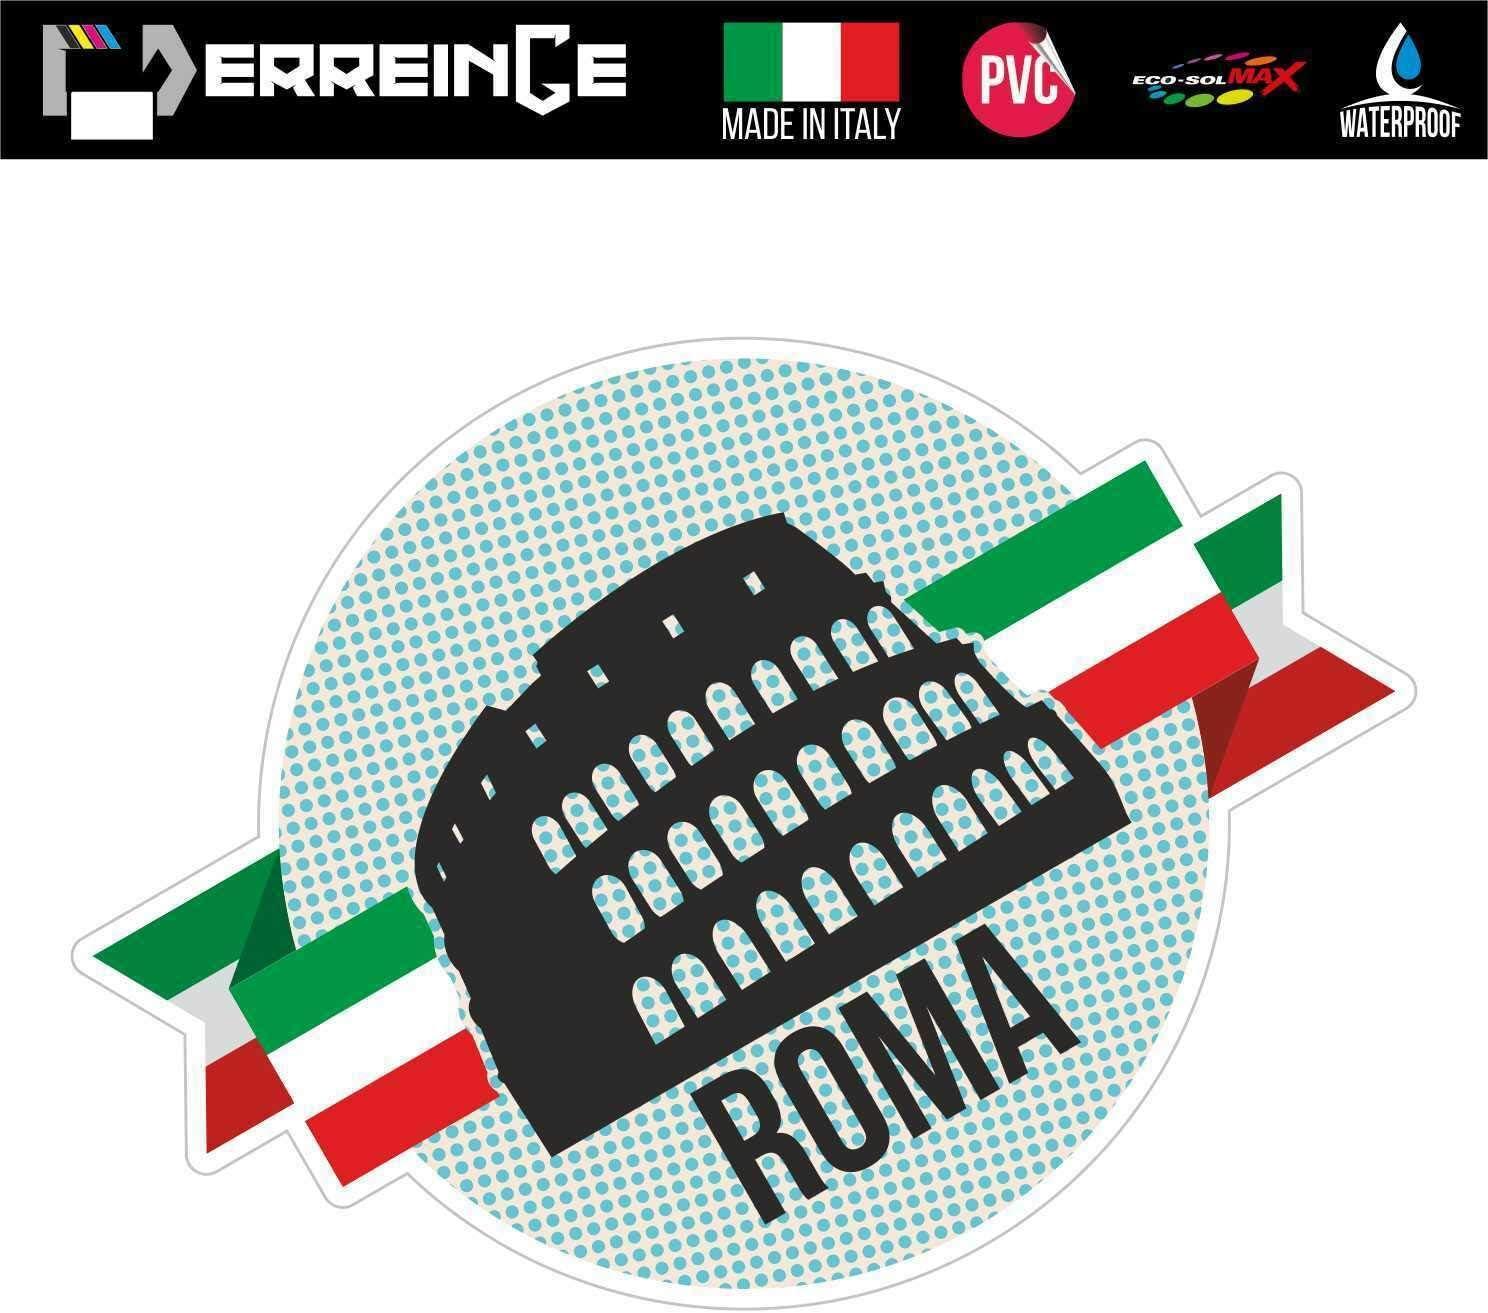 Sturzhelm Roller Portable Wand ERREINGE Sticker ROM COLISEUM ITALIEN SOUVENIR Aufkleber geformtes PVC f/ür Abziehbild Wohnmobil cm 10 Motorrad Auto